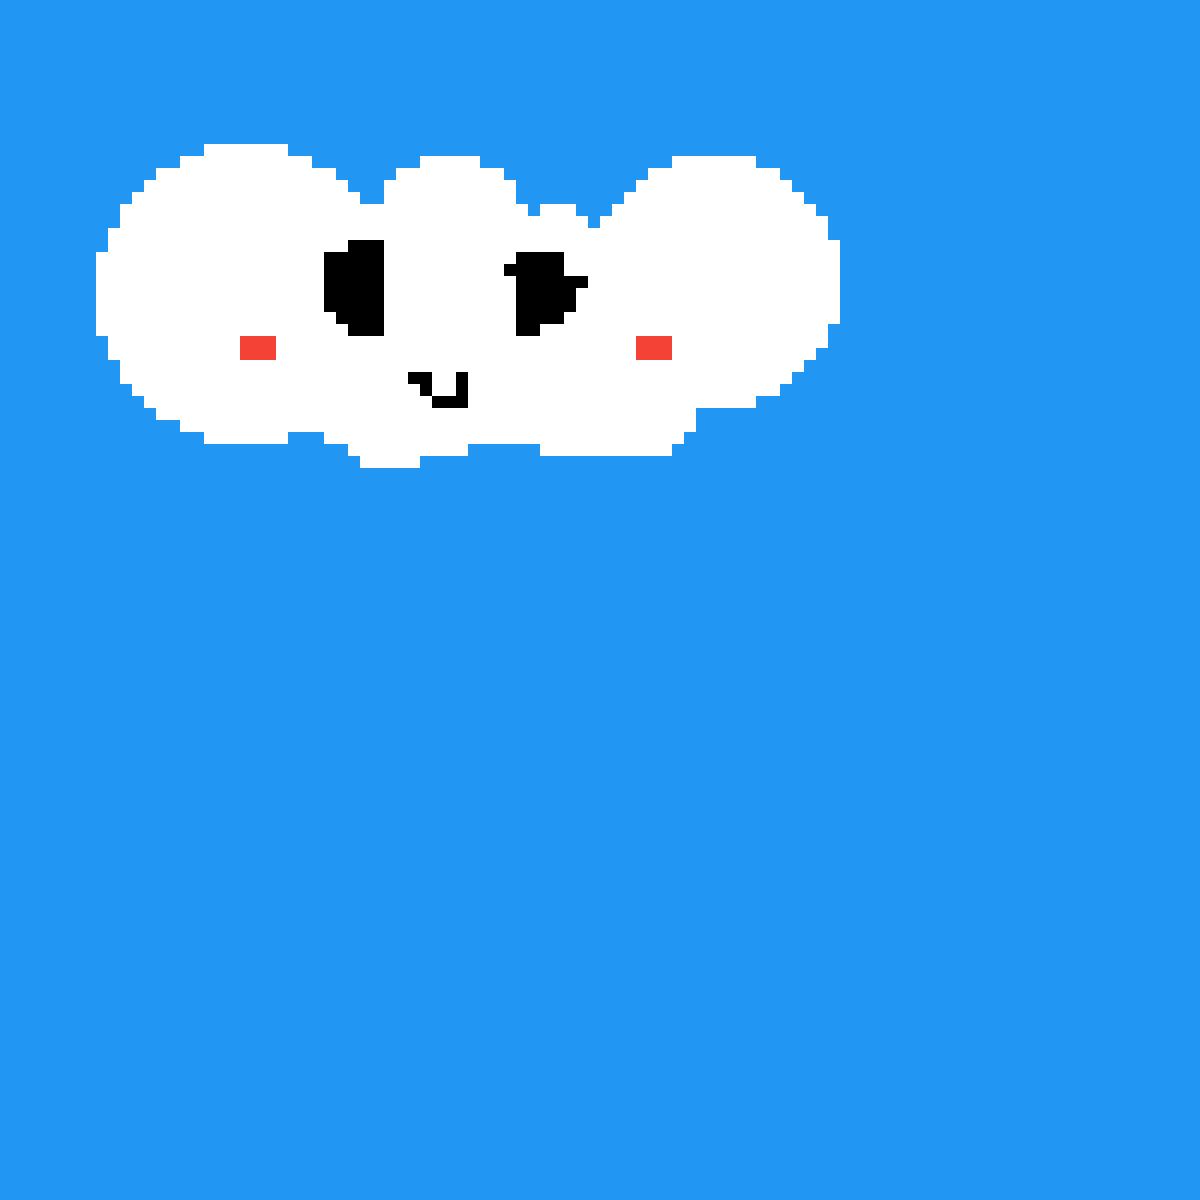 kwie cloud by Foxygaming342